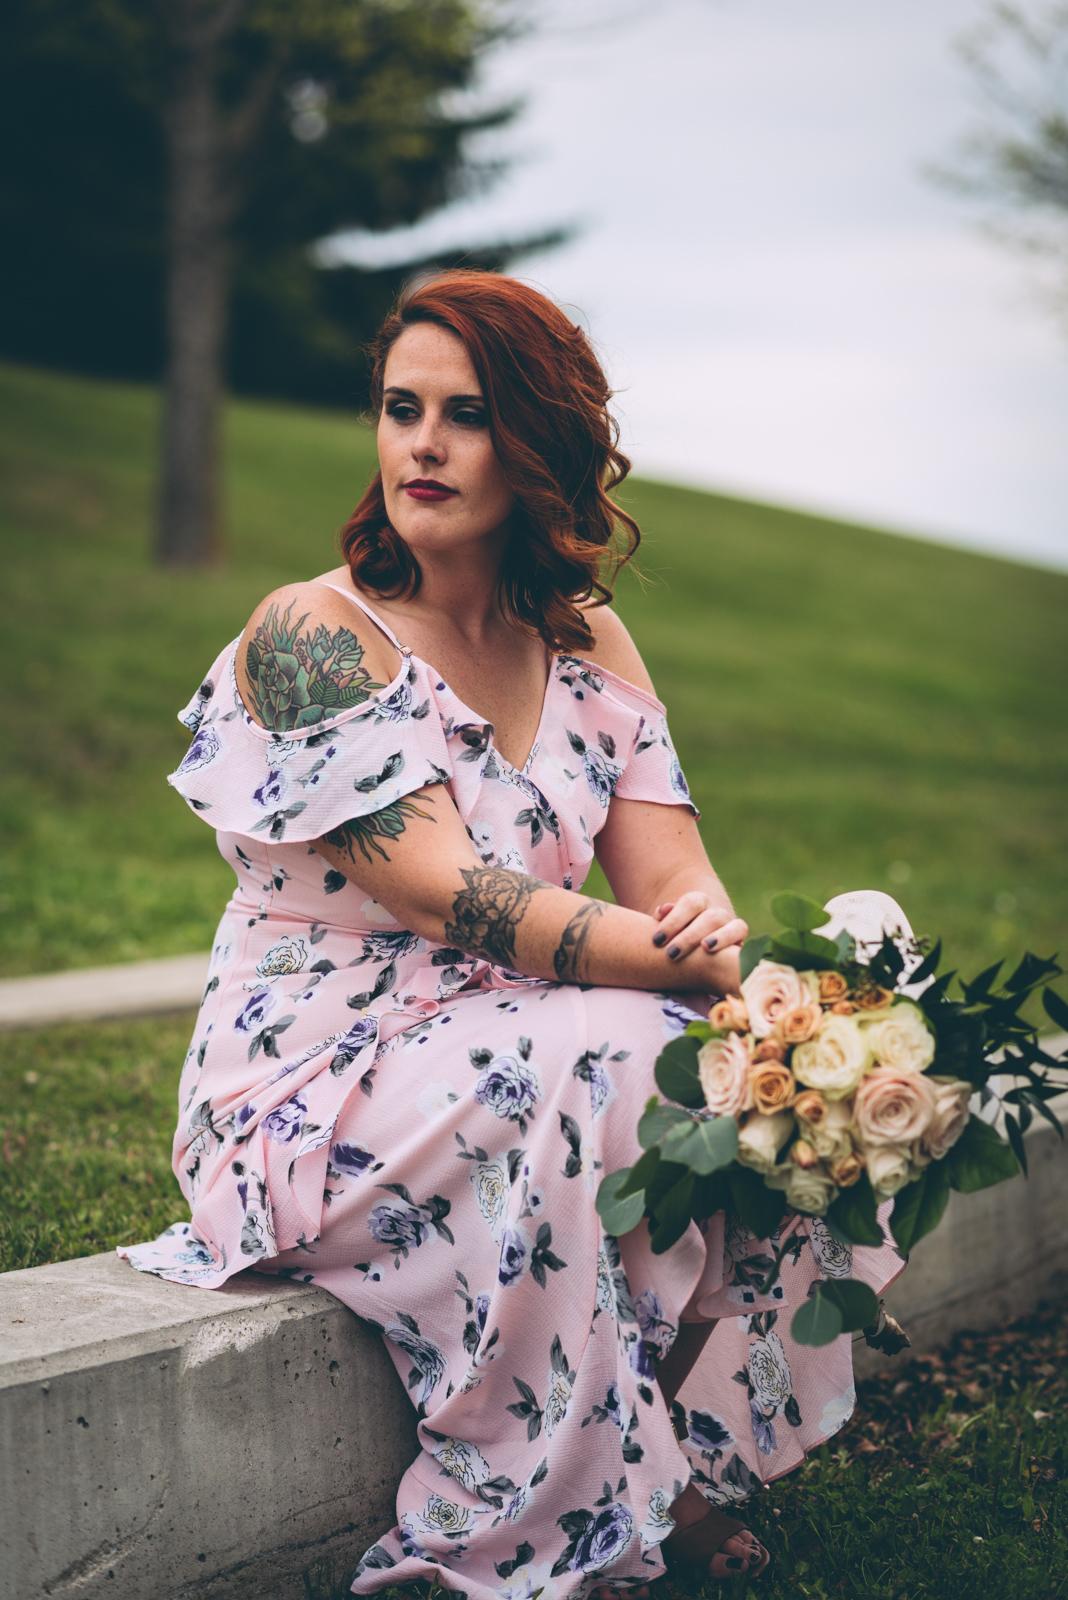 top-wedding-photos-2018-blog-24.jpg